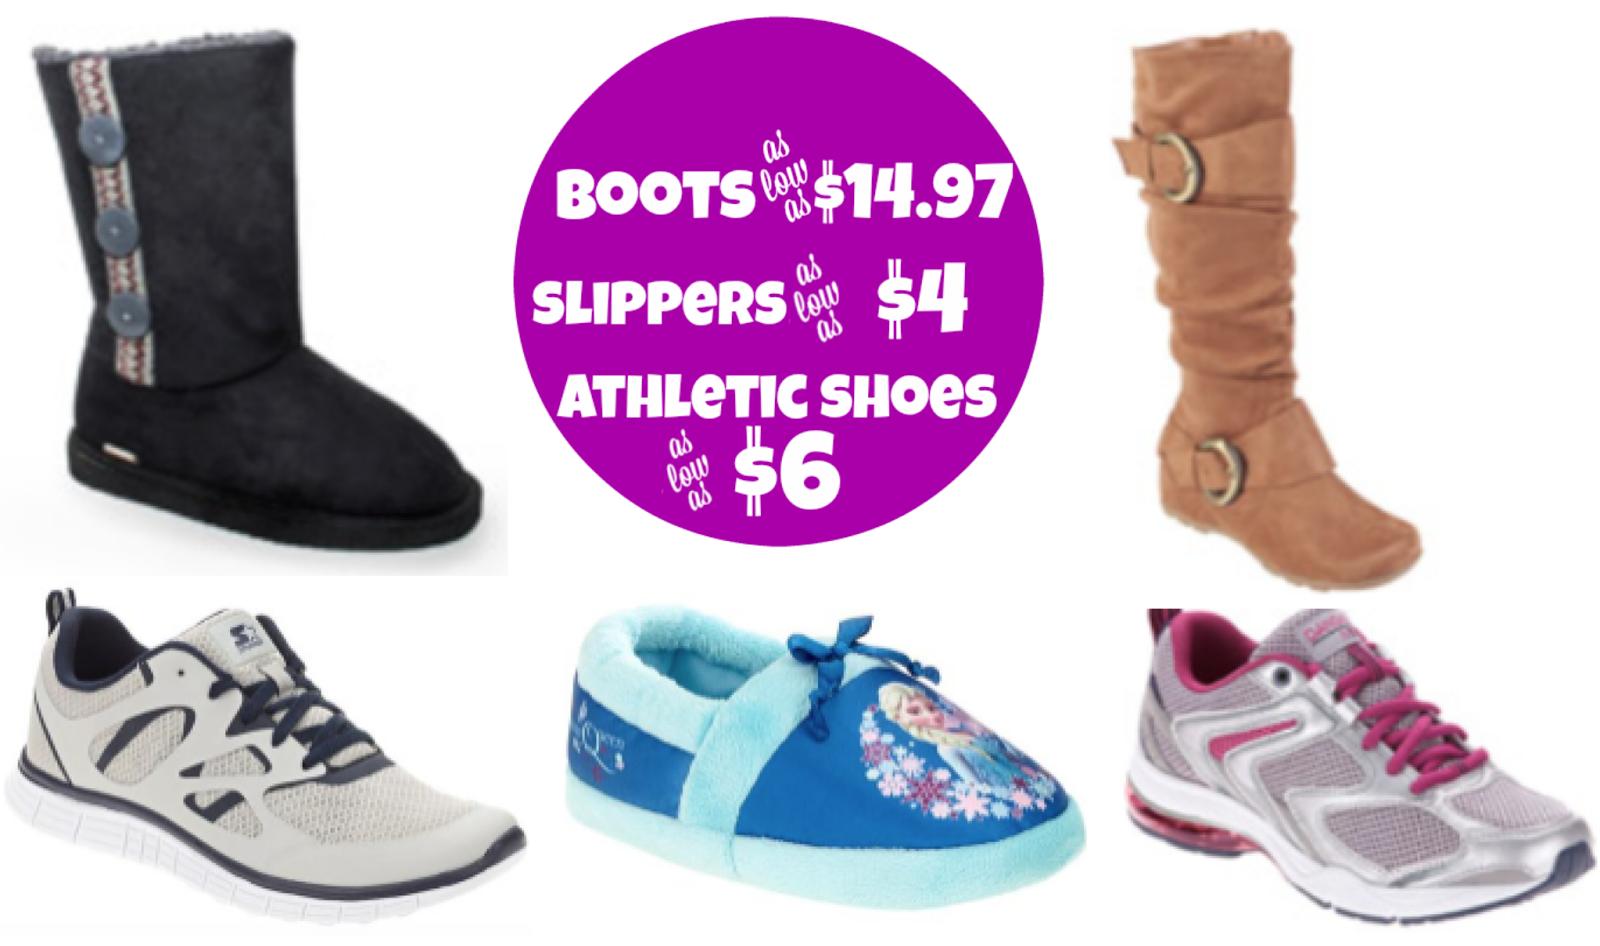 http://www.thebinderladies.com/2015/01/walmart-com-clearance-shoe-slipper.html#.VLBbDofduyM